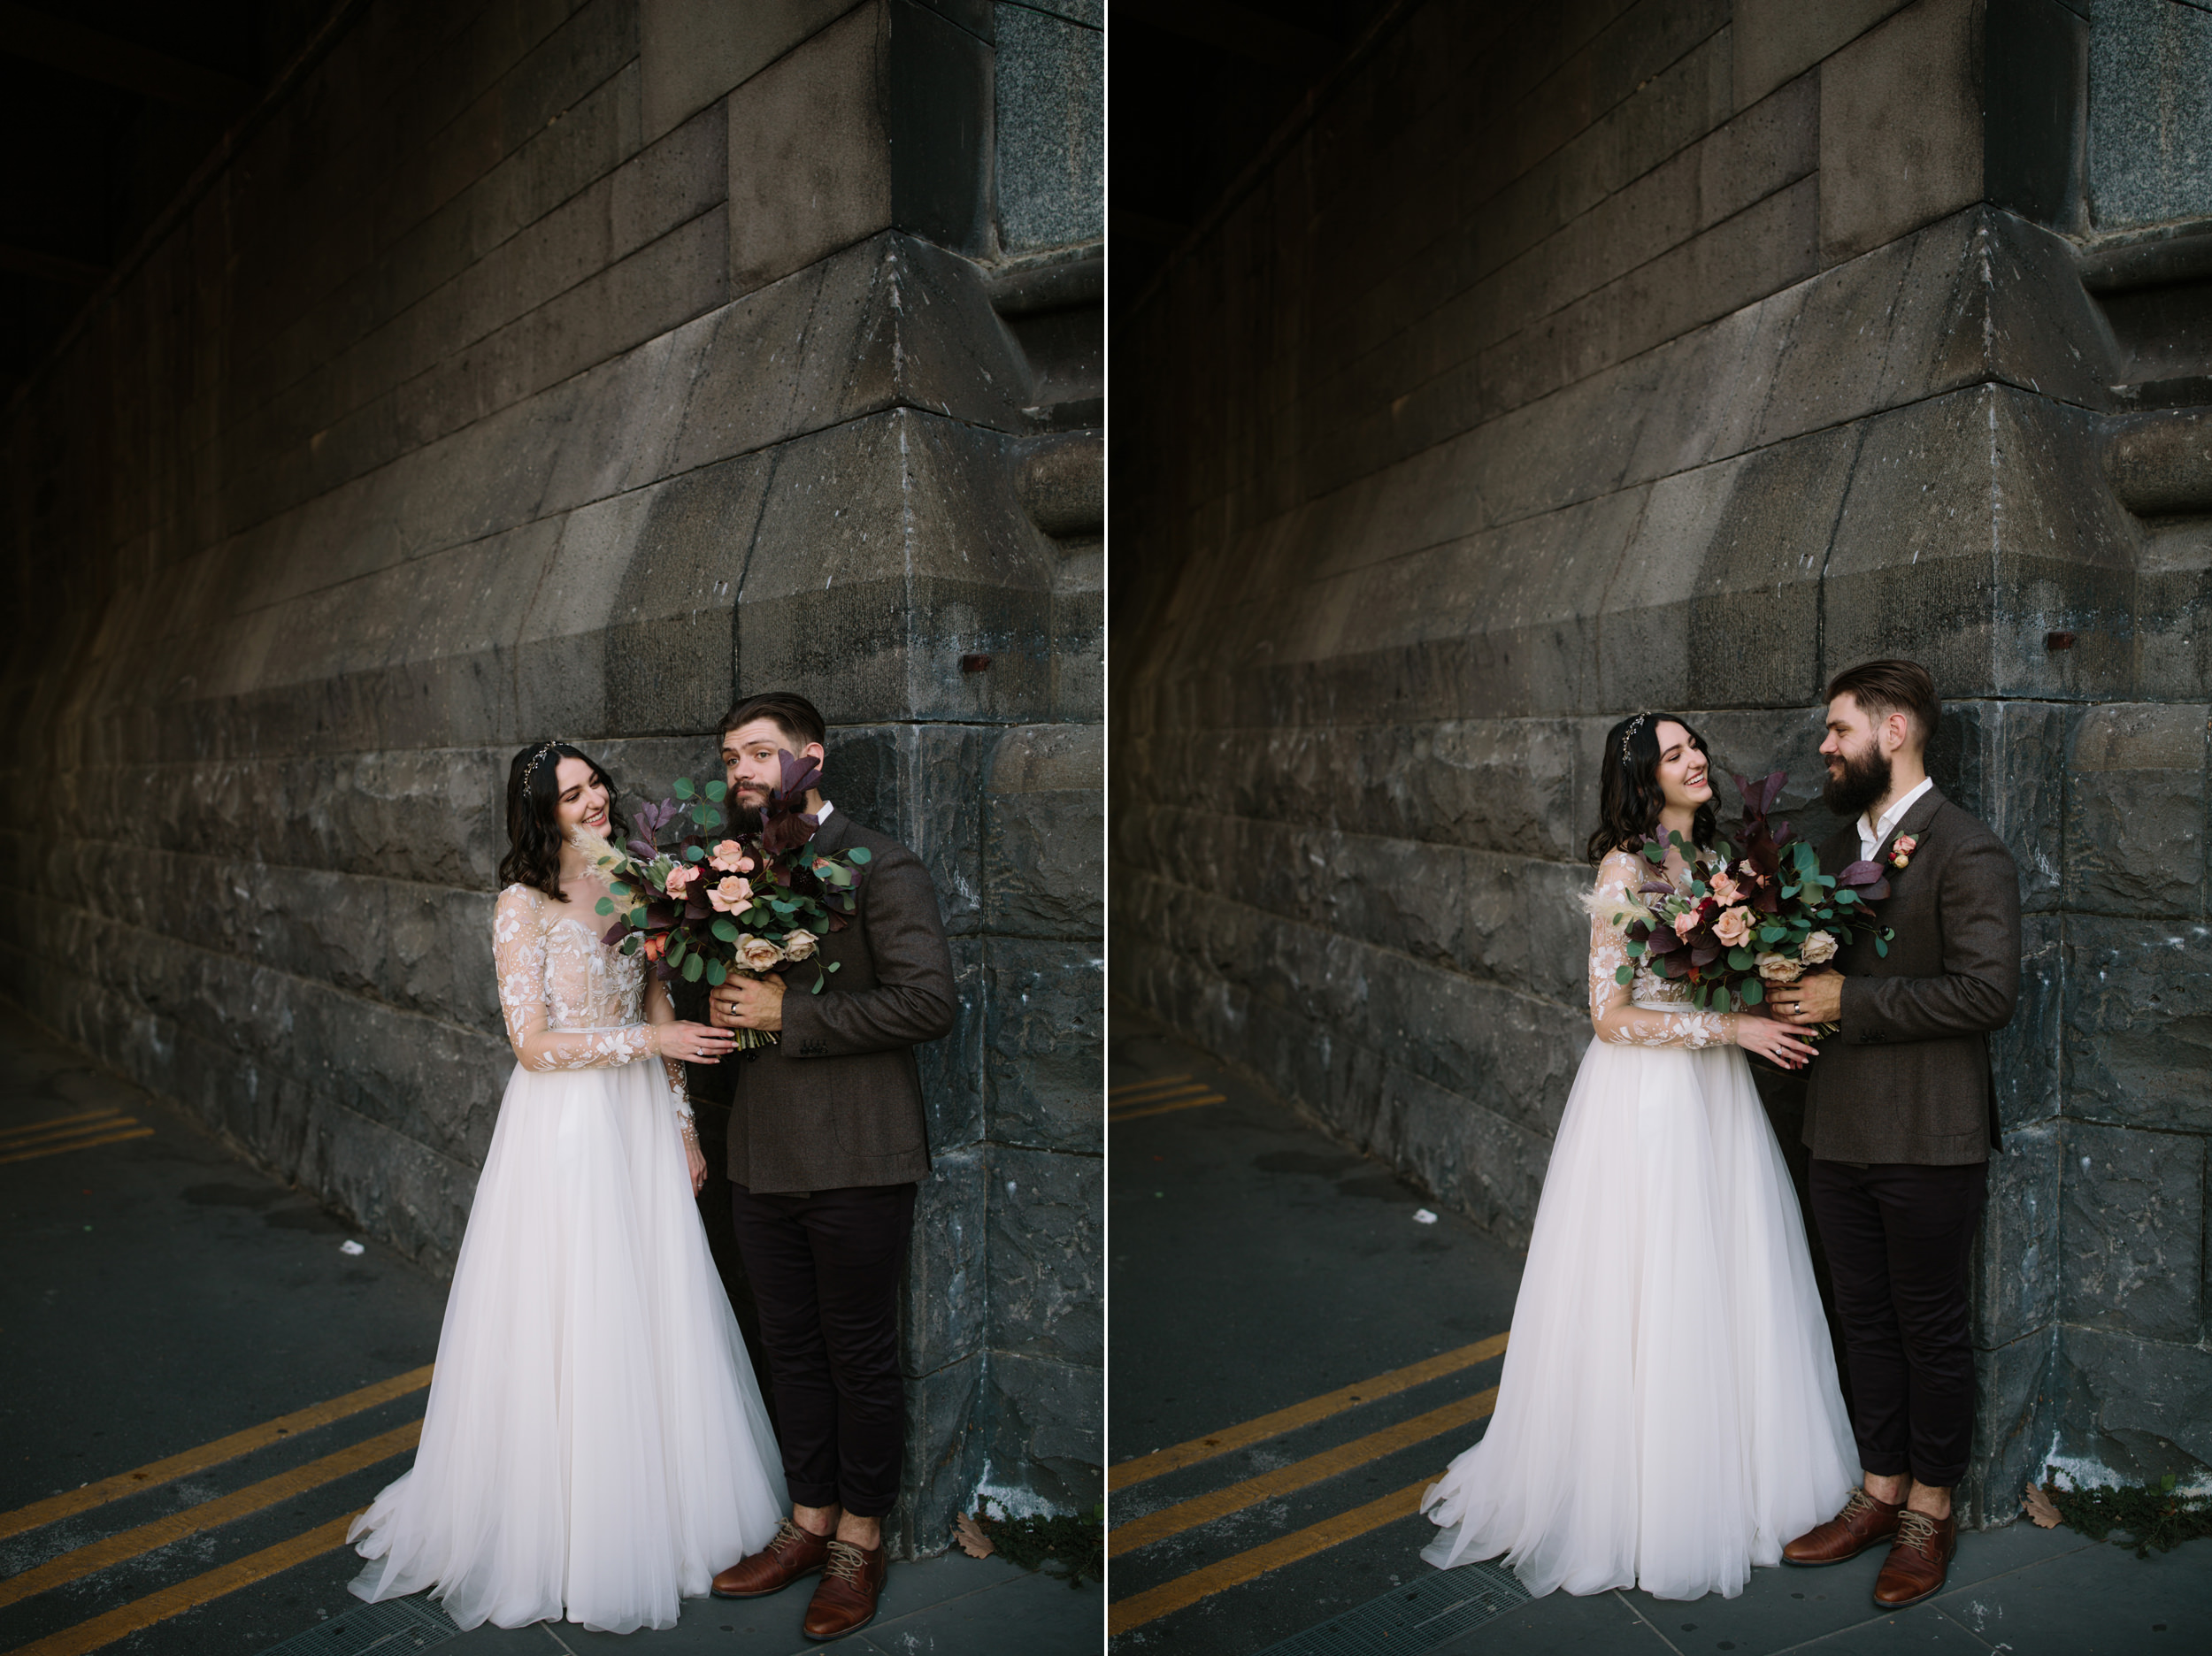 I-Got-You-Babe-Weddings-Hayley-Sam-NGV-Melbourne0099.JPG